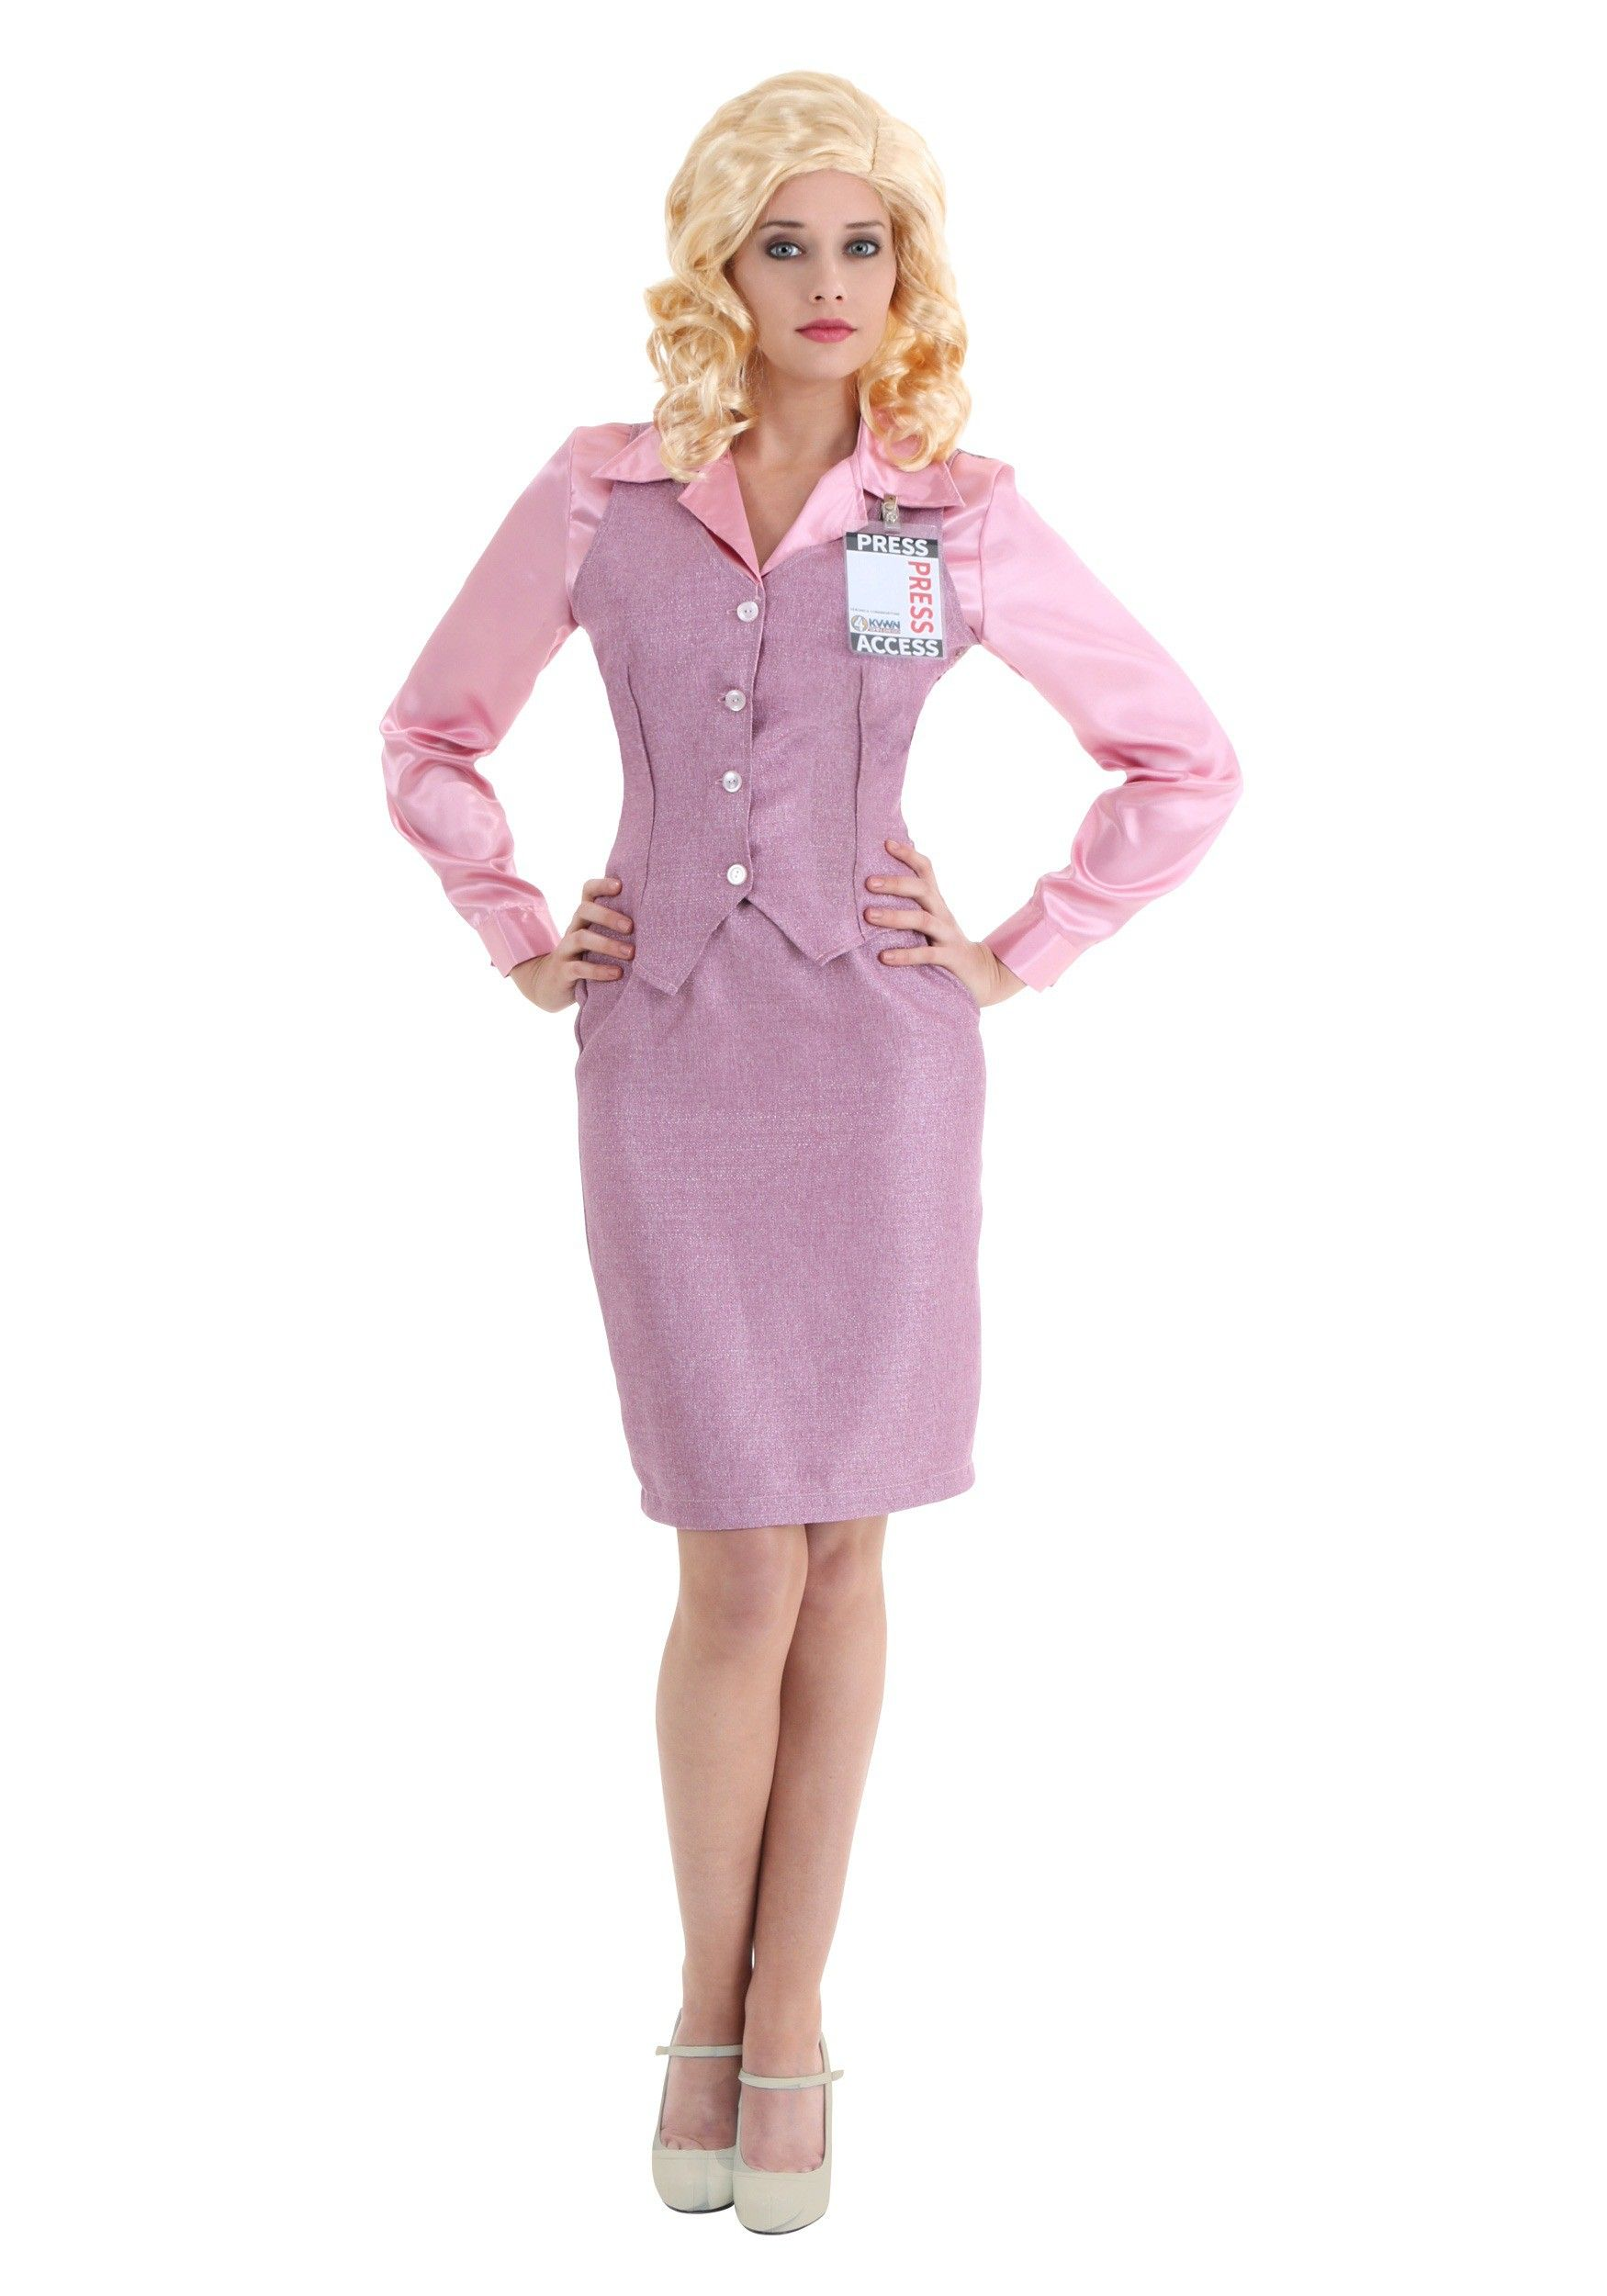 Veronica Corningstone Costume Costumes for women